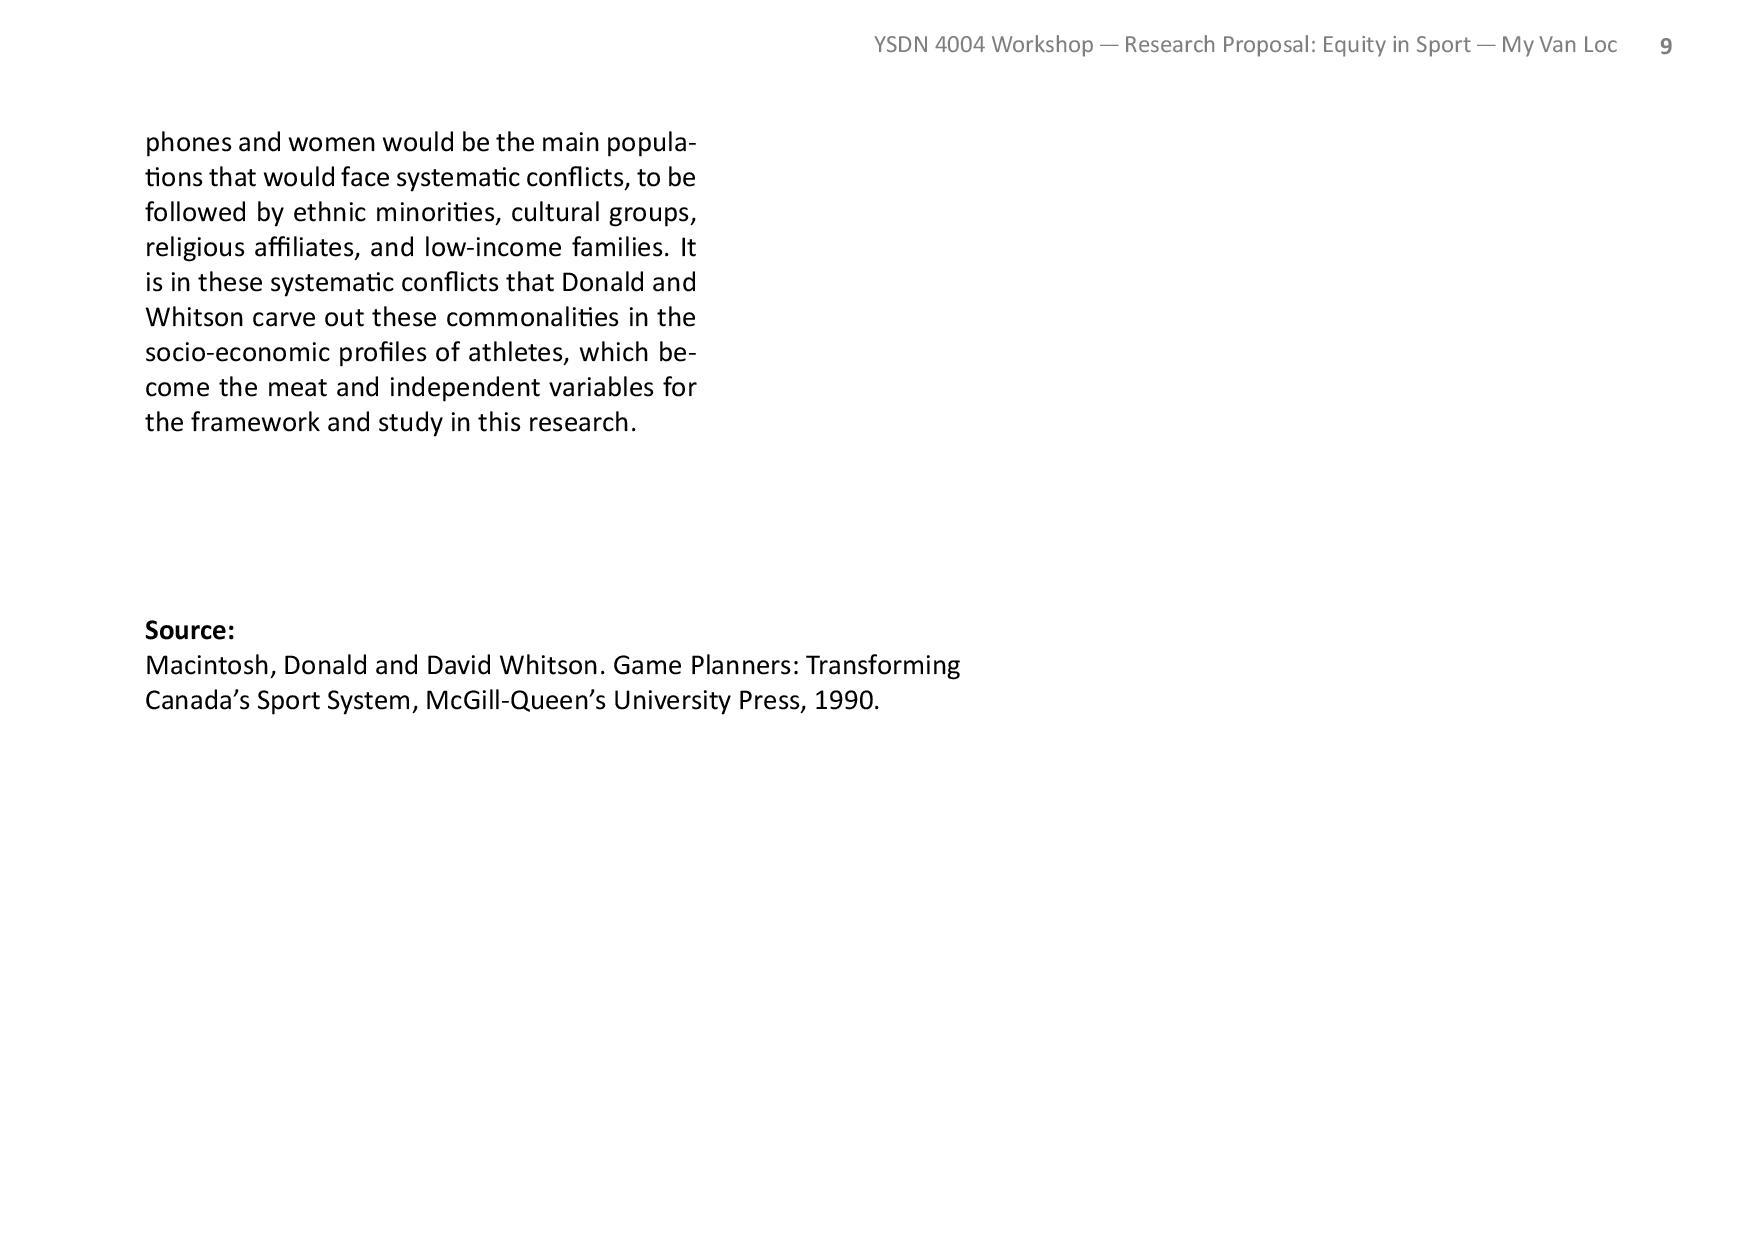 LocMy_ysdn4004_pr1_proposal-page-009.jpg